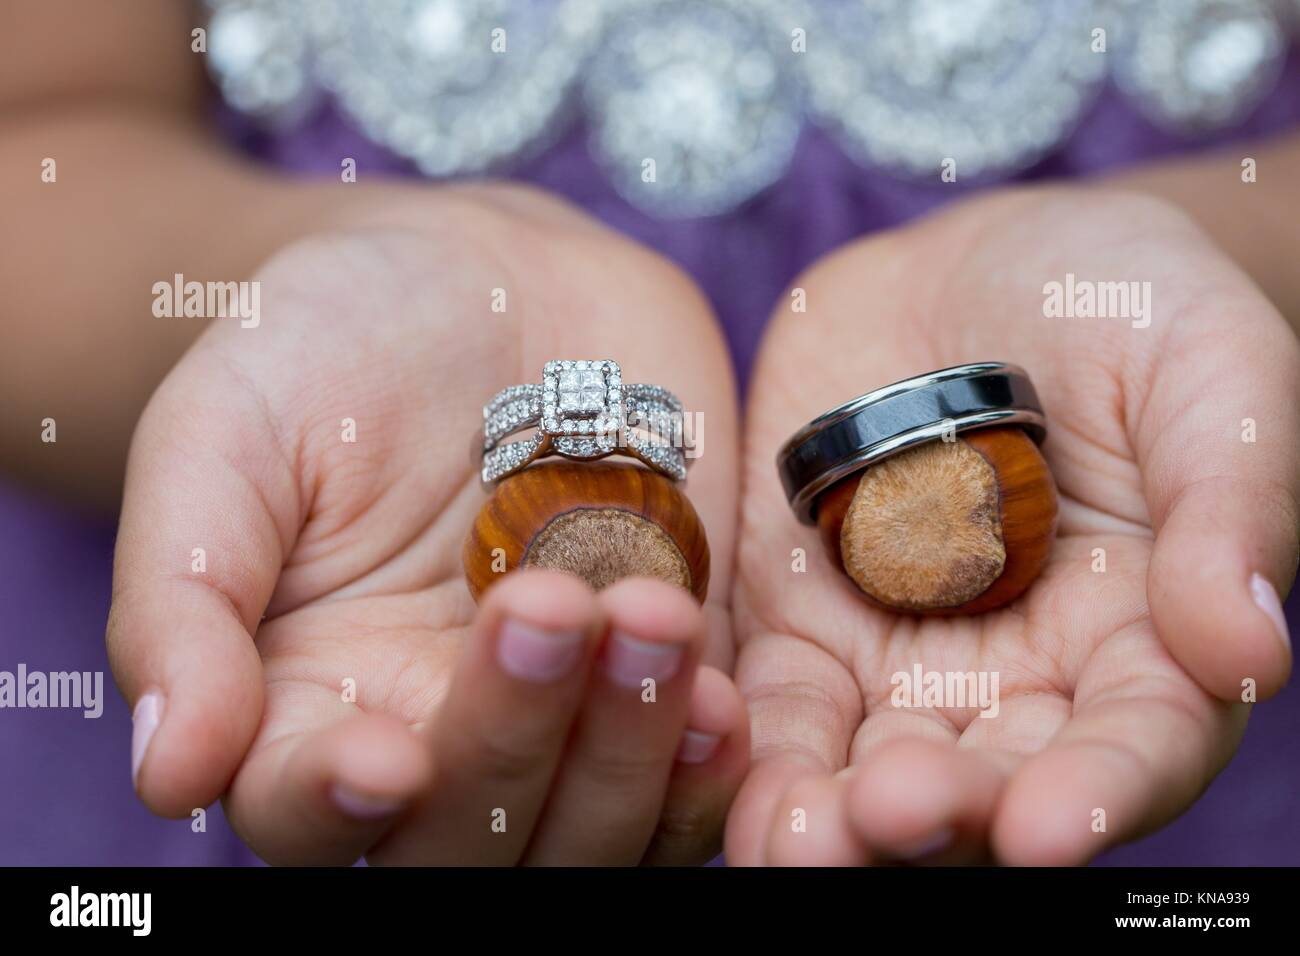 Ring Bearer Imágenes De Stock & Ring Bearer Fotos De Stock - Alamy